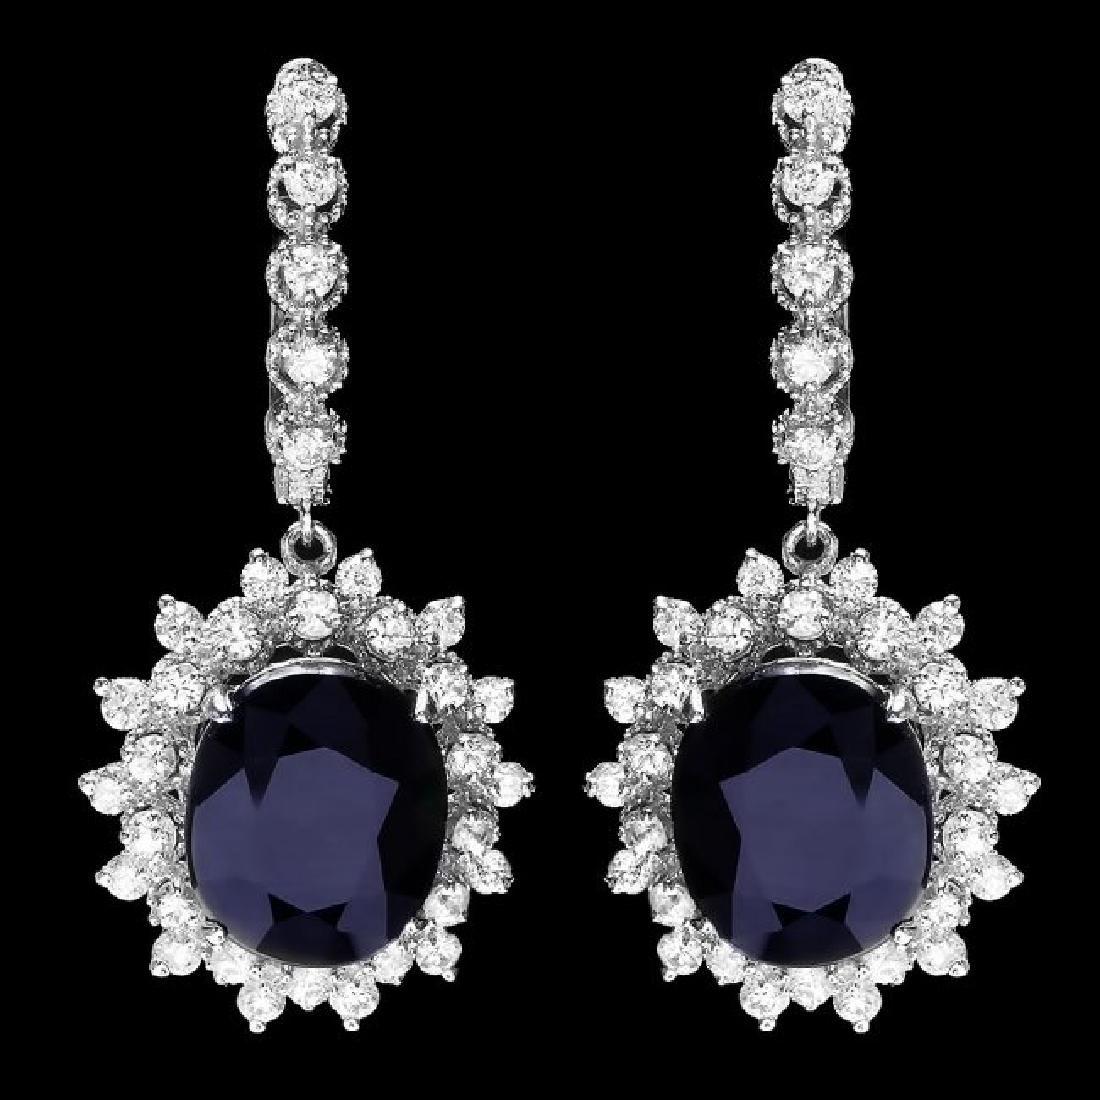 14k Gold 14.8ct Sapphire 2ct Diamond Earrings